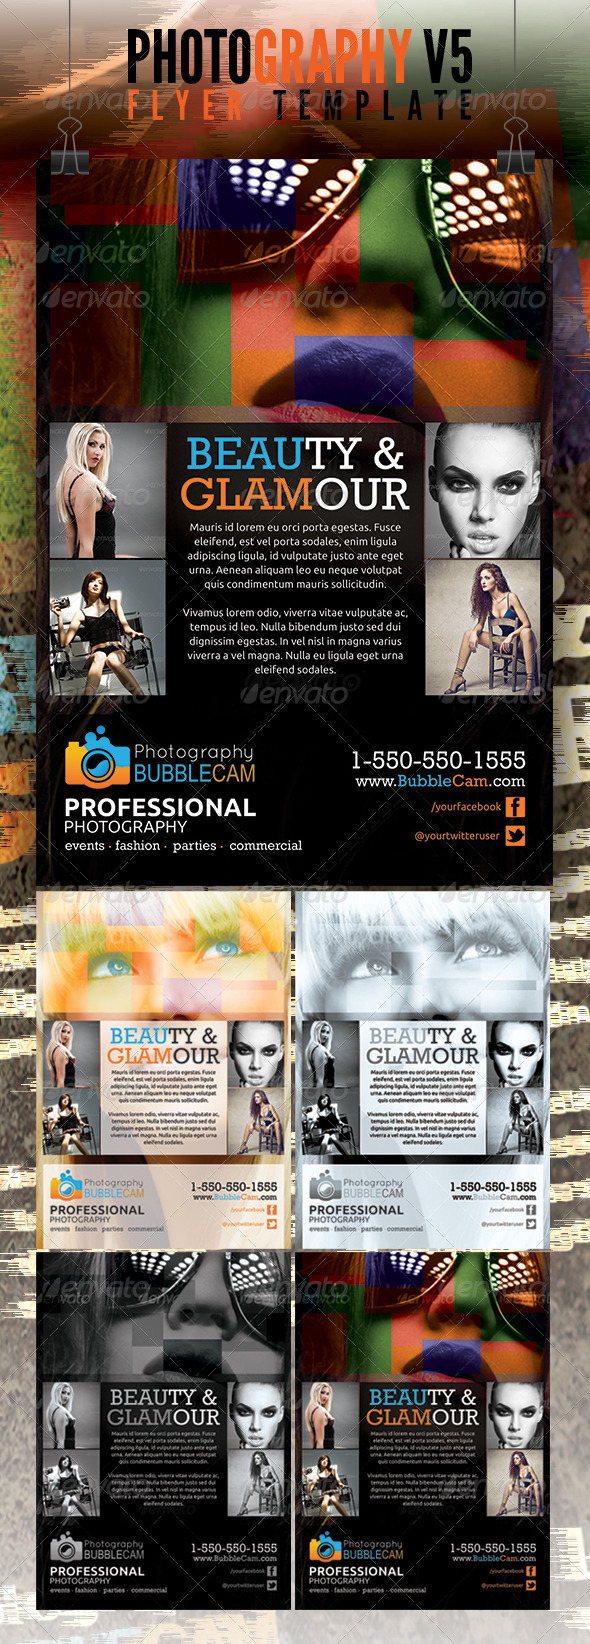 Photography Flyer v5 - Commerce Flyers